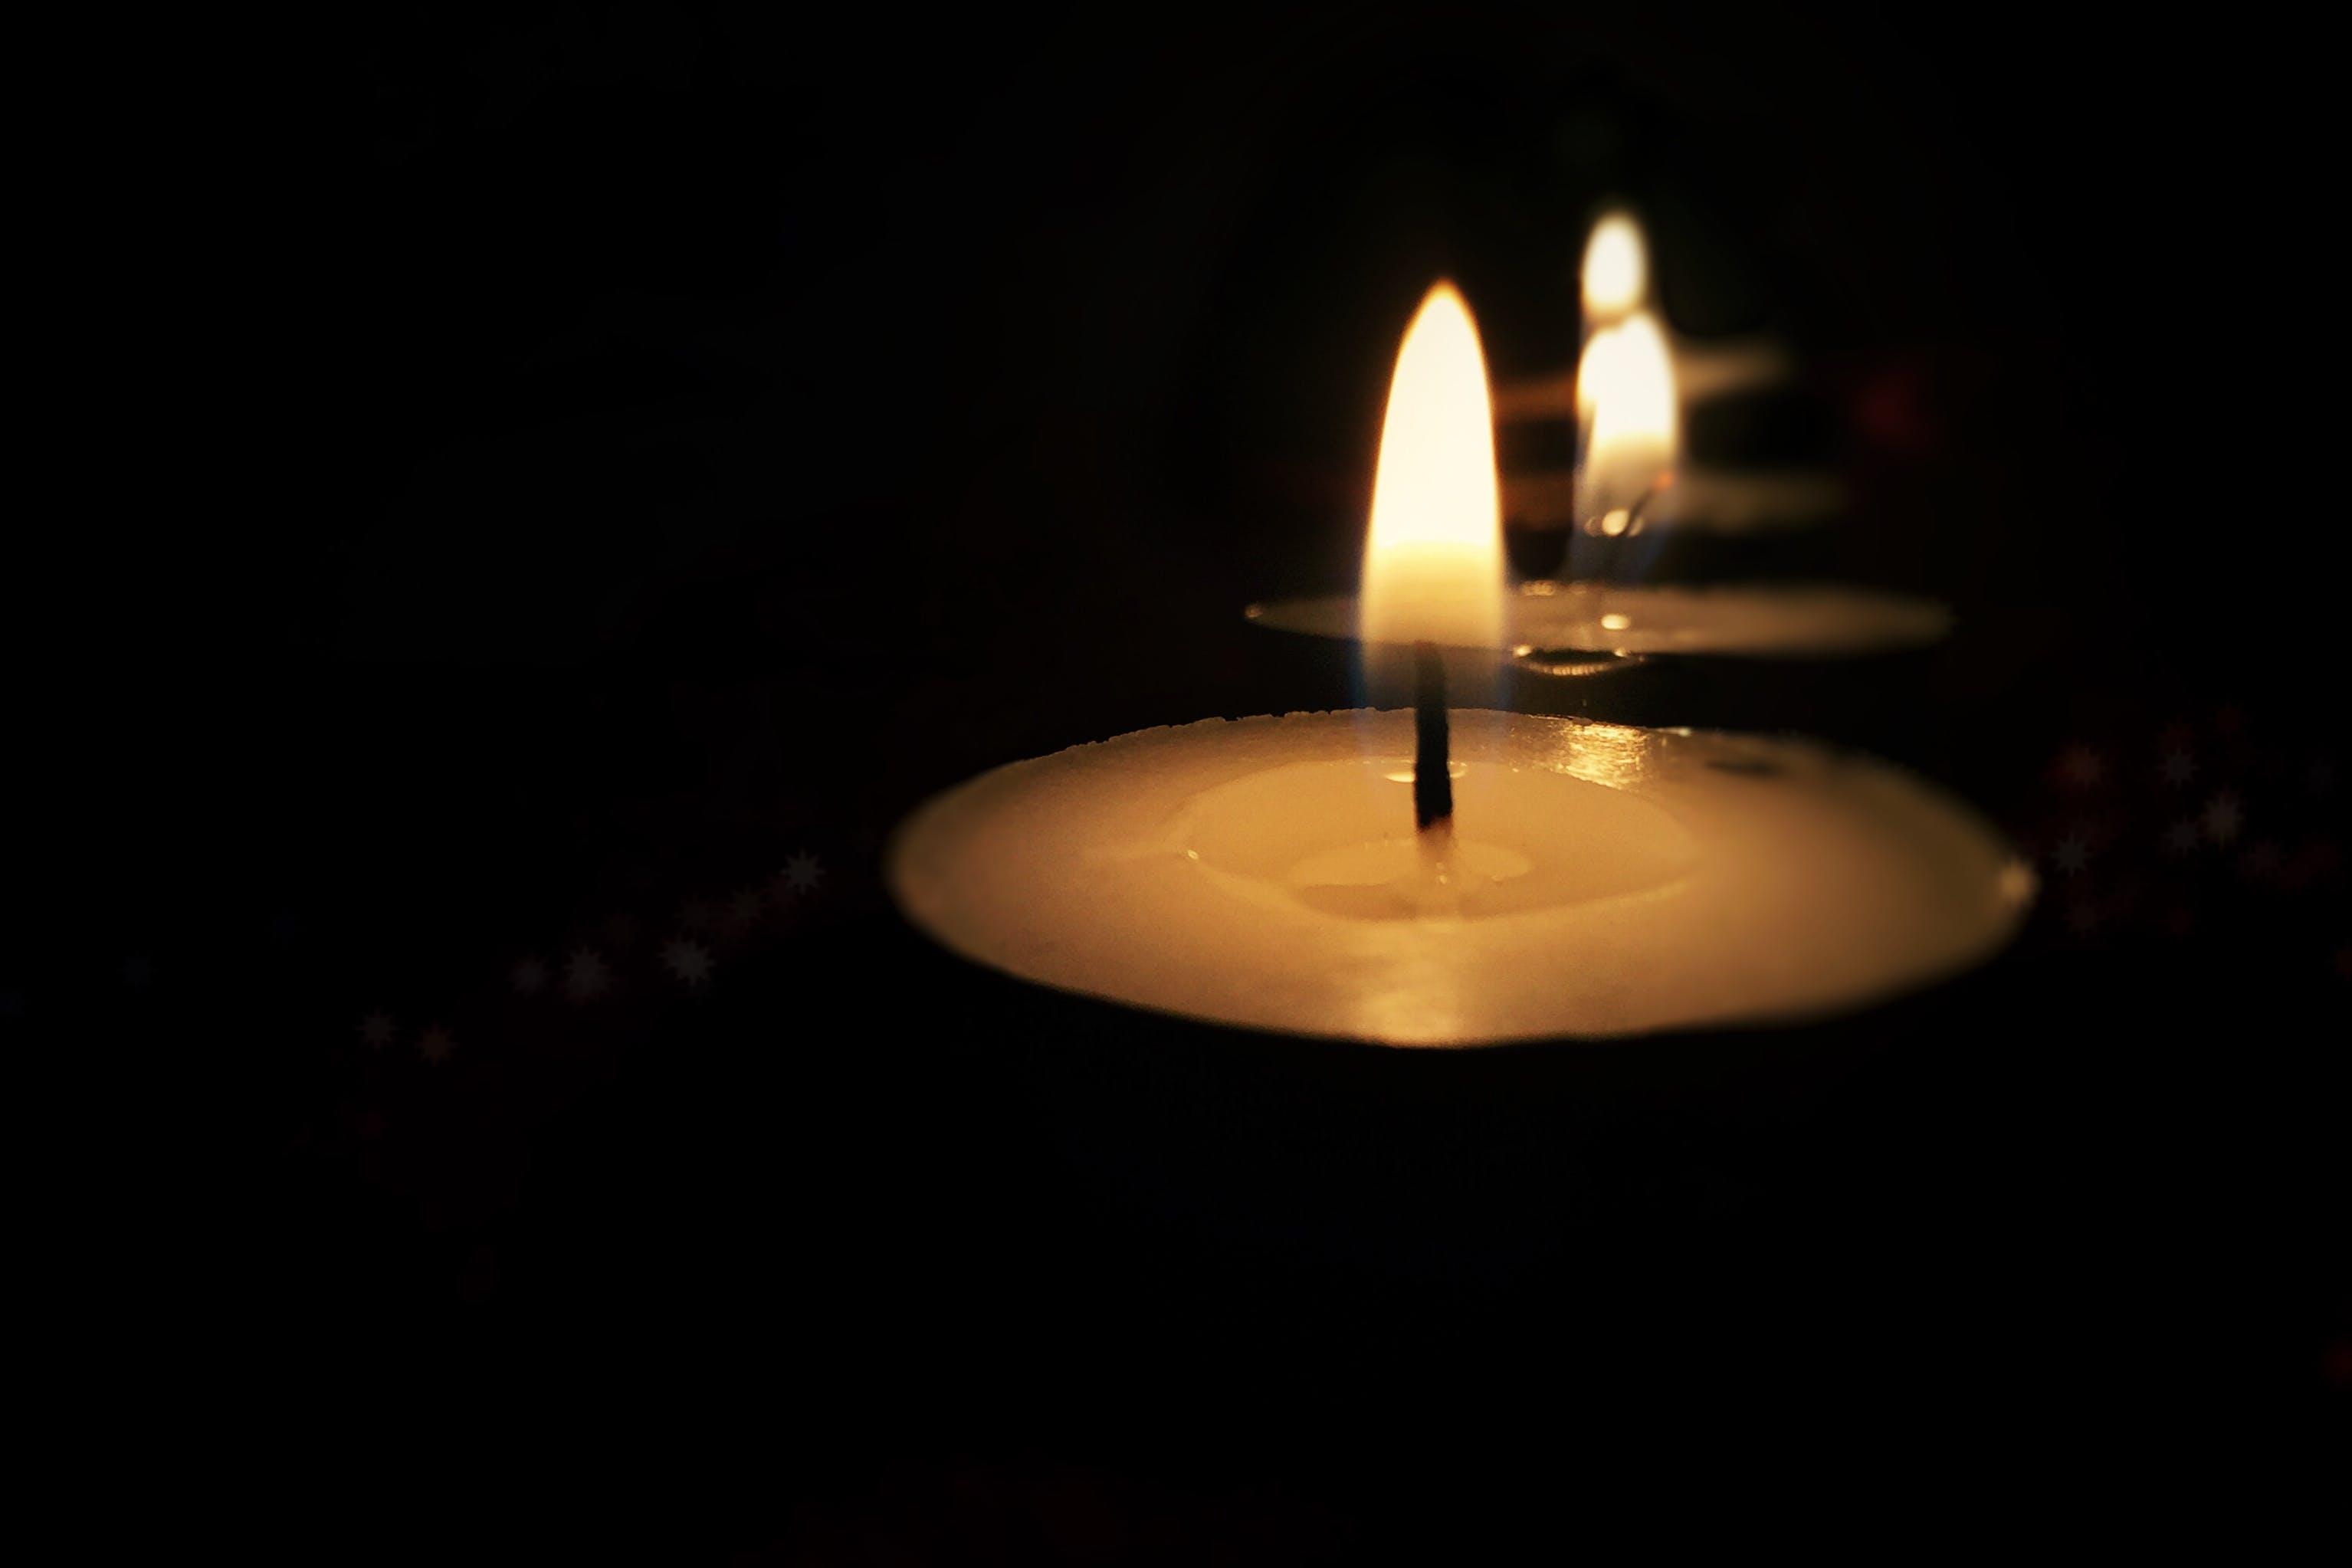 Free stock photo of candlelight, desktop backgrounds, desktop wallpaper, fairy lights